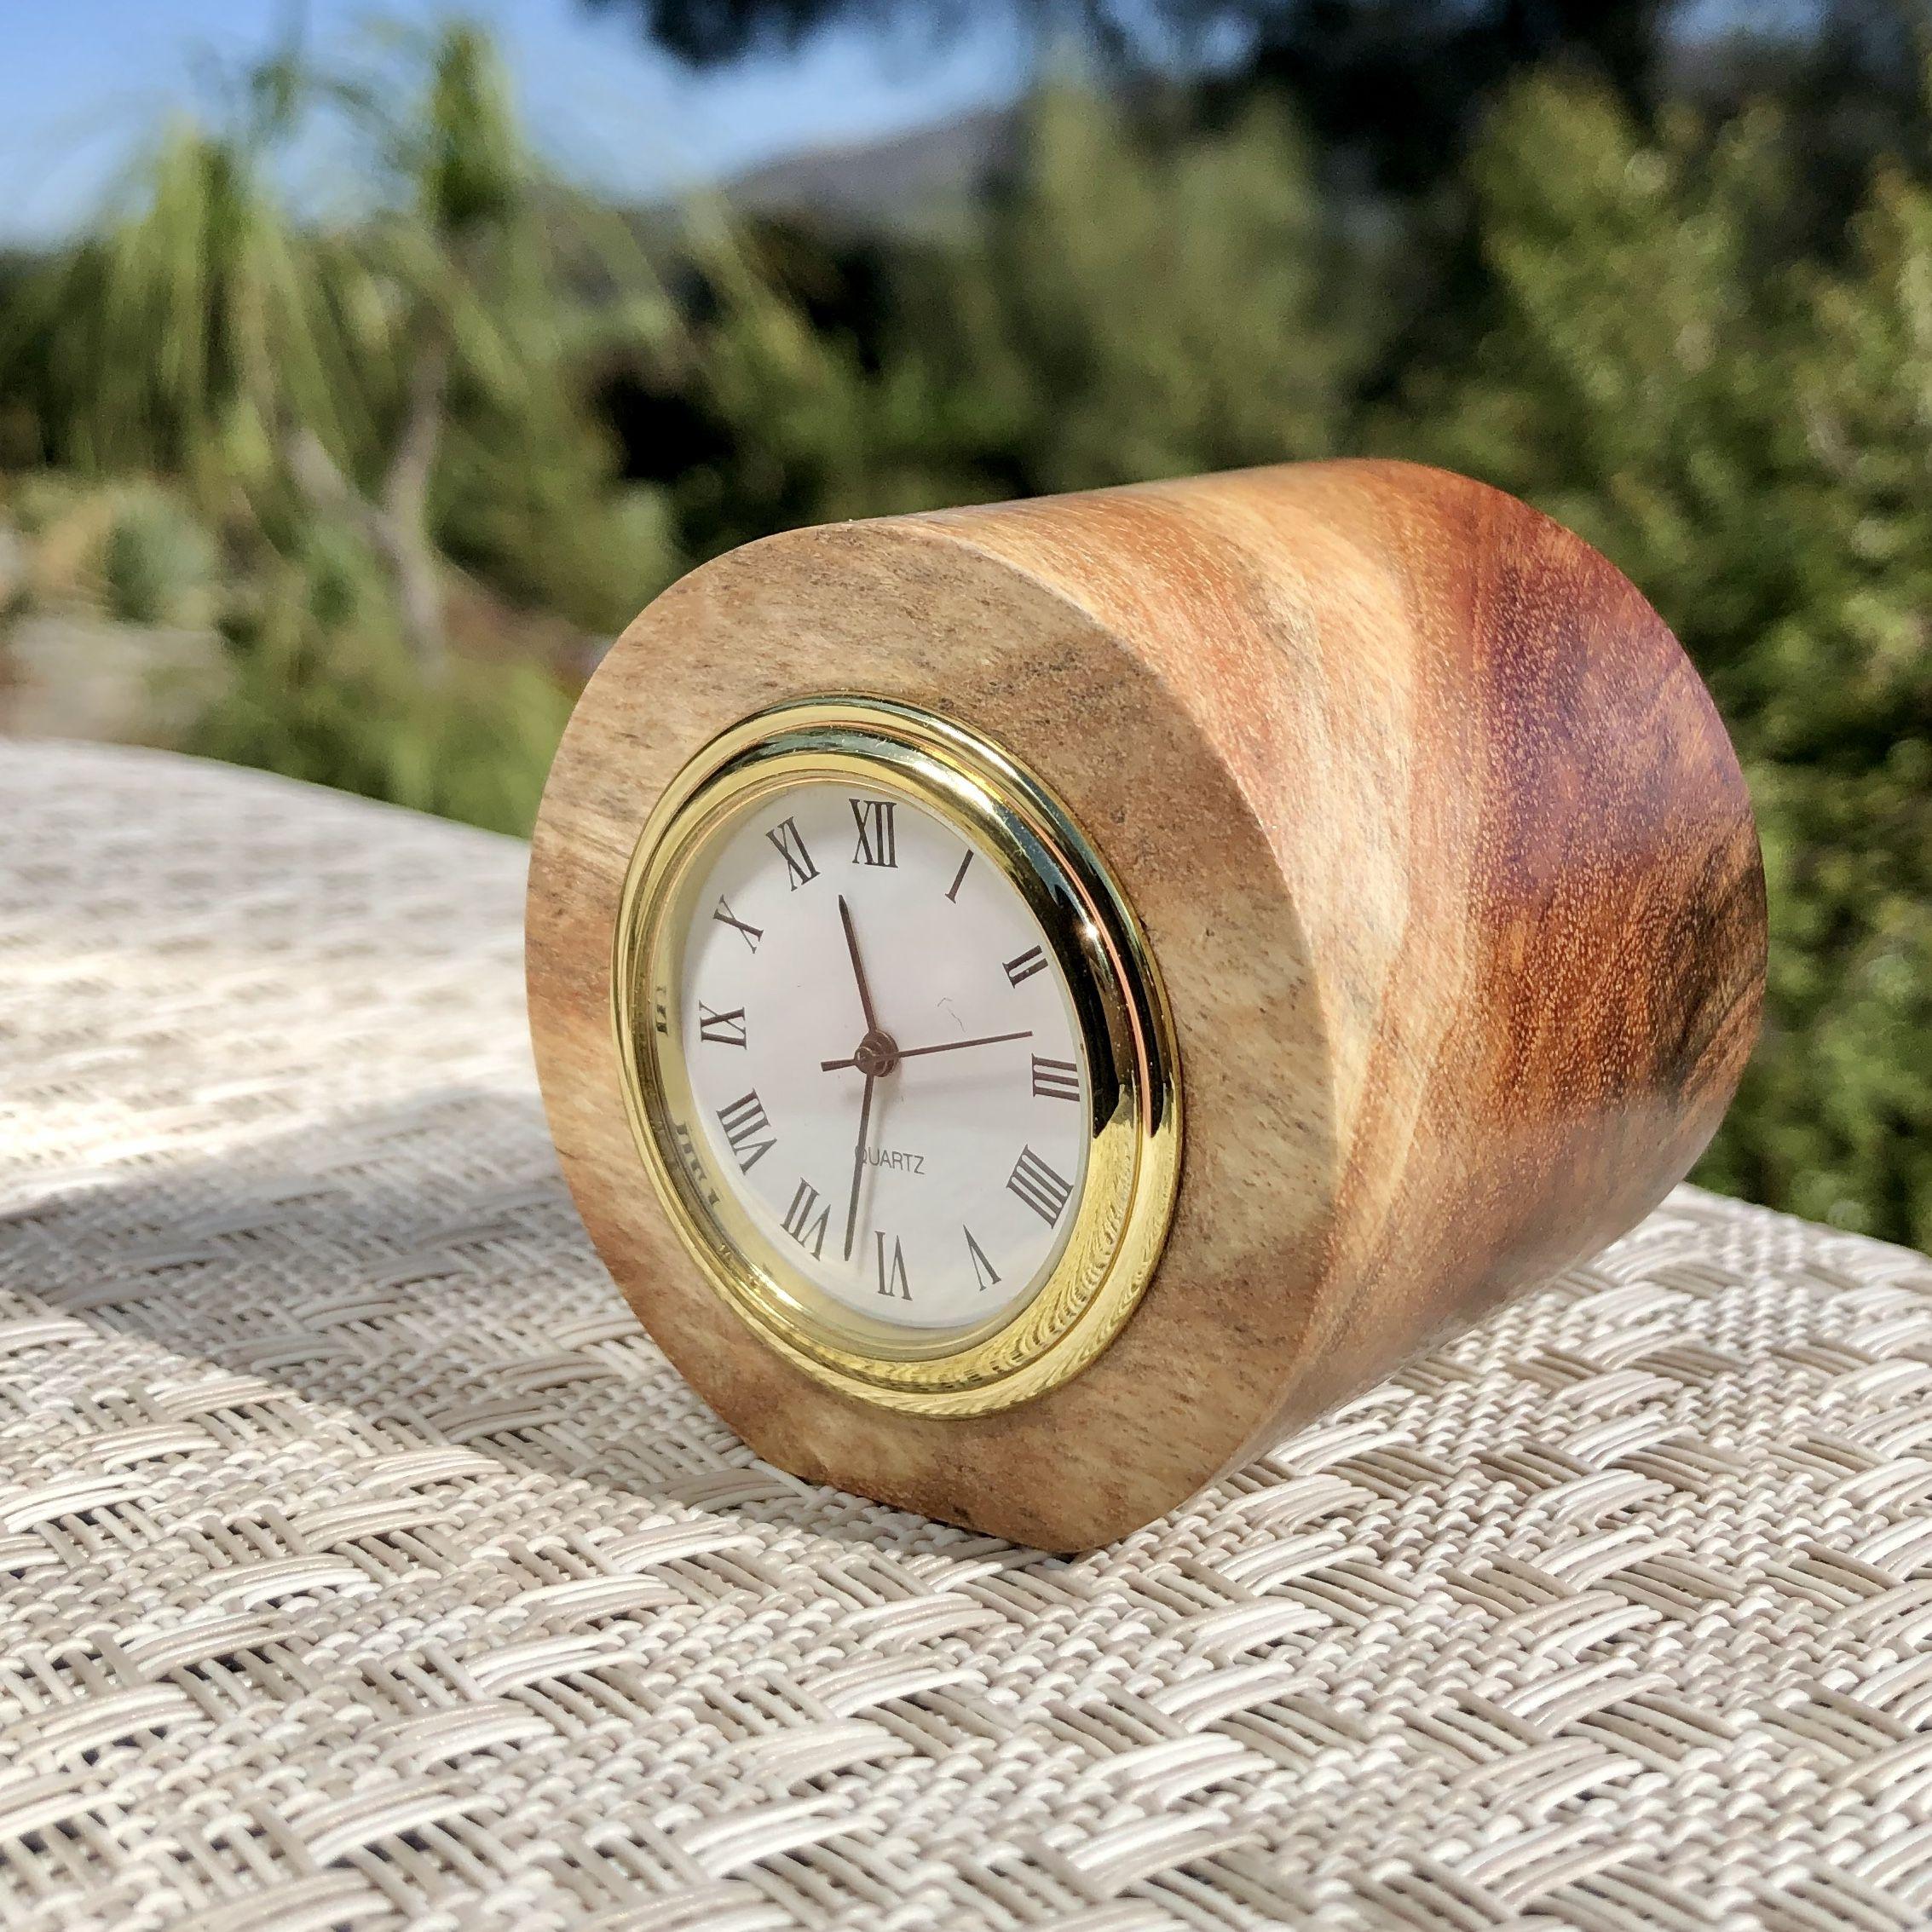 Small Wooden Desk Clock Clock Wood Analog Clock Wedding Gift